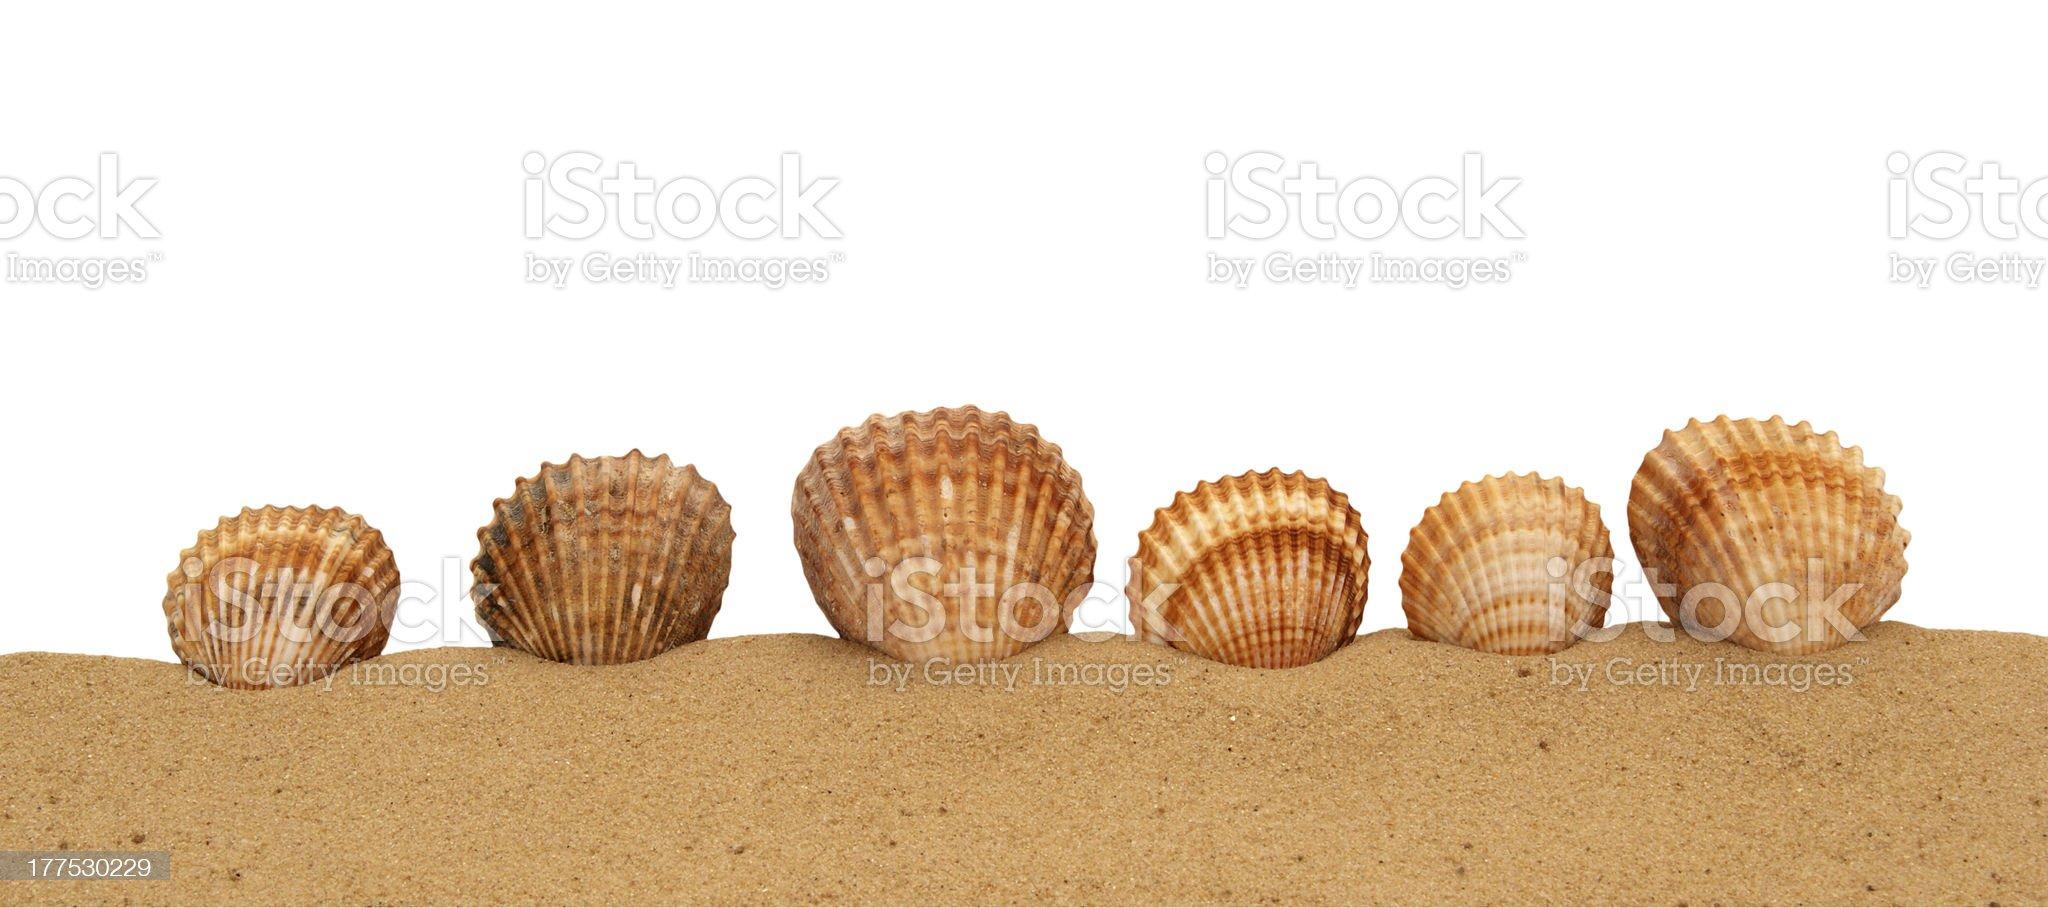 Large seashells on the sand, Studio shot royalty-free stock photo